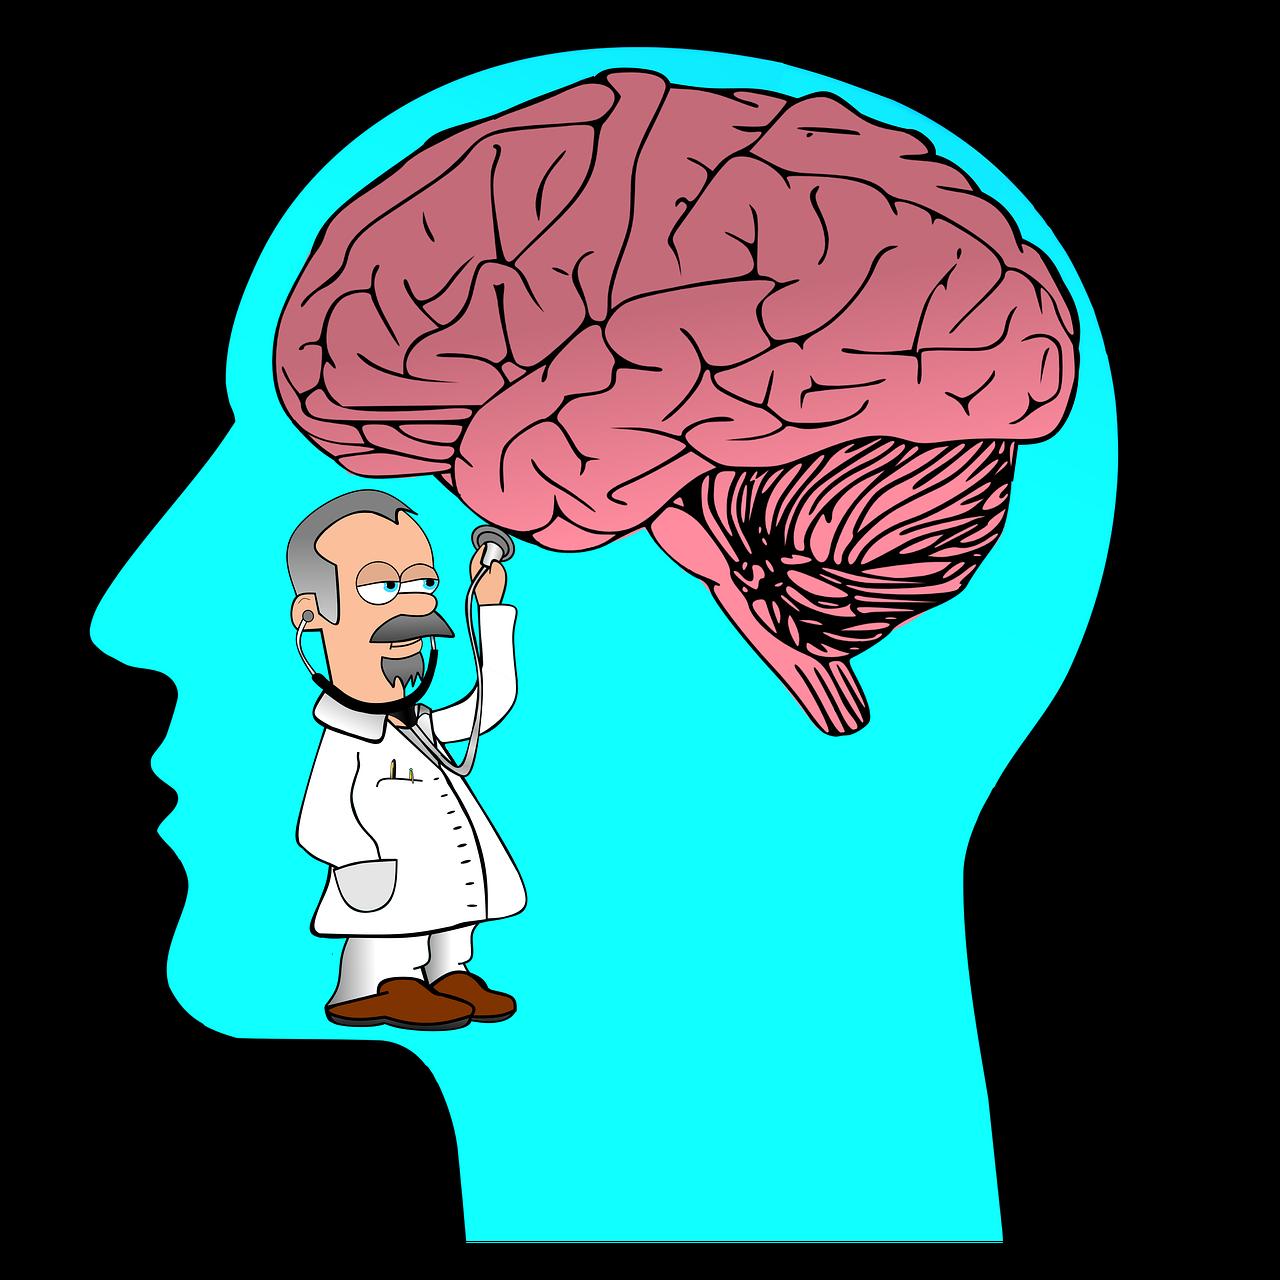 Clip Art Mentally Ill Psyche - Free image on Pixabay